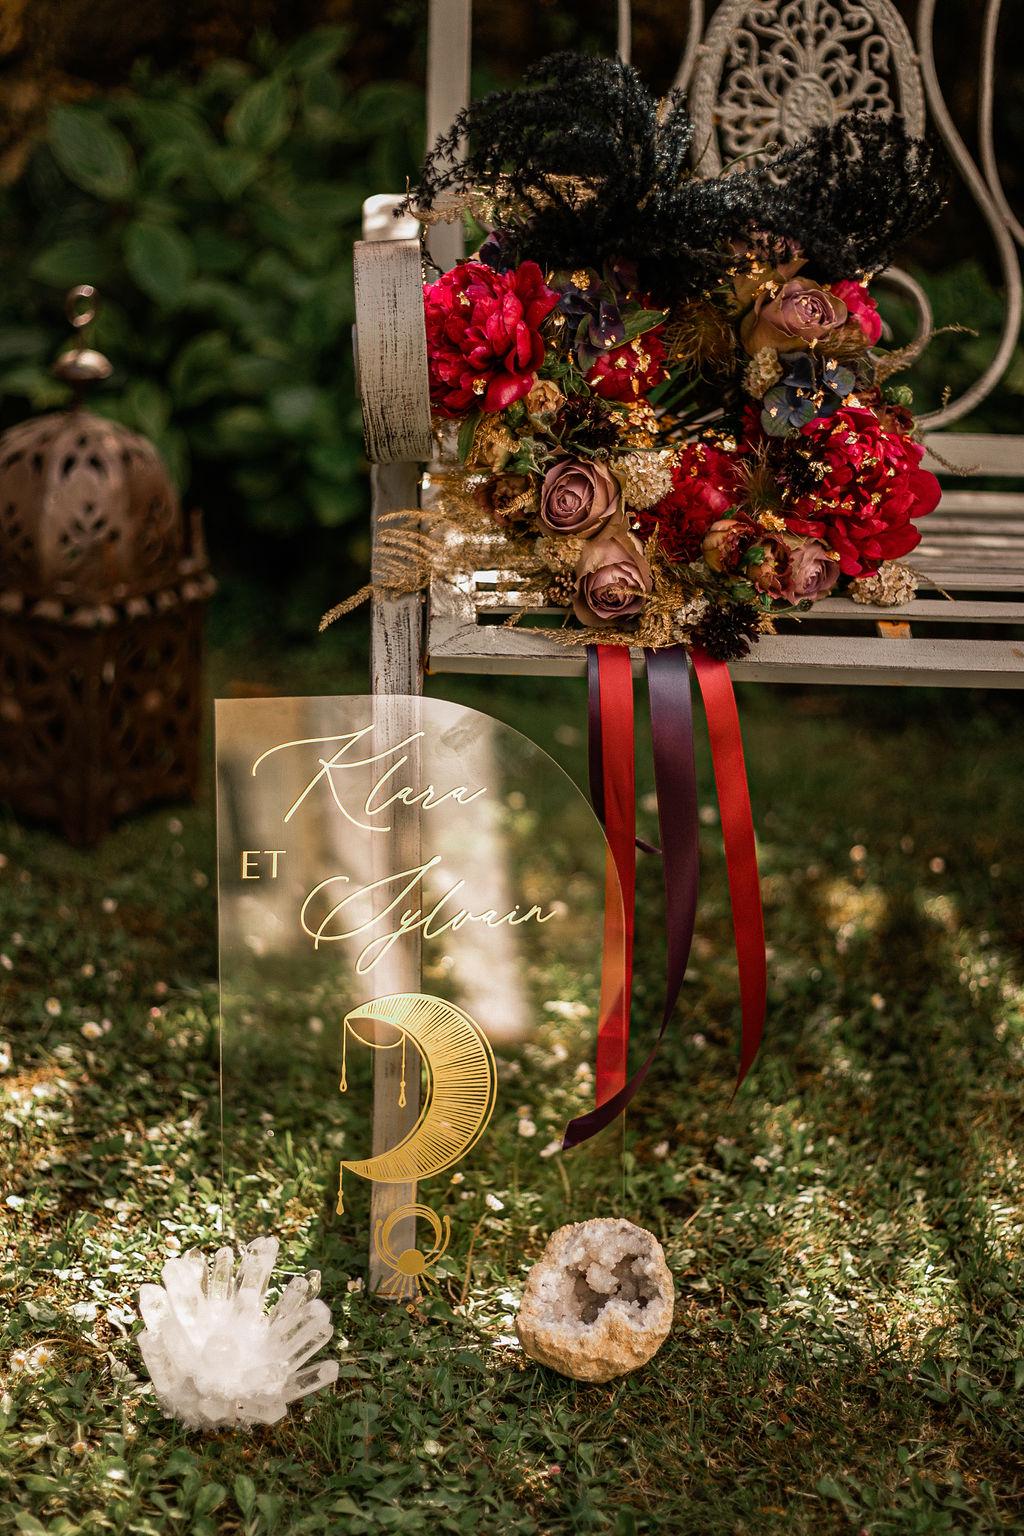 alternative celestial wedding - celestial wedding stationery - clear wedding stationery - alternative wedding bouquet